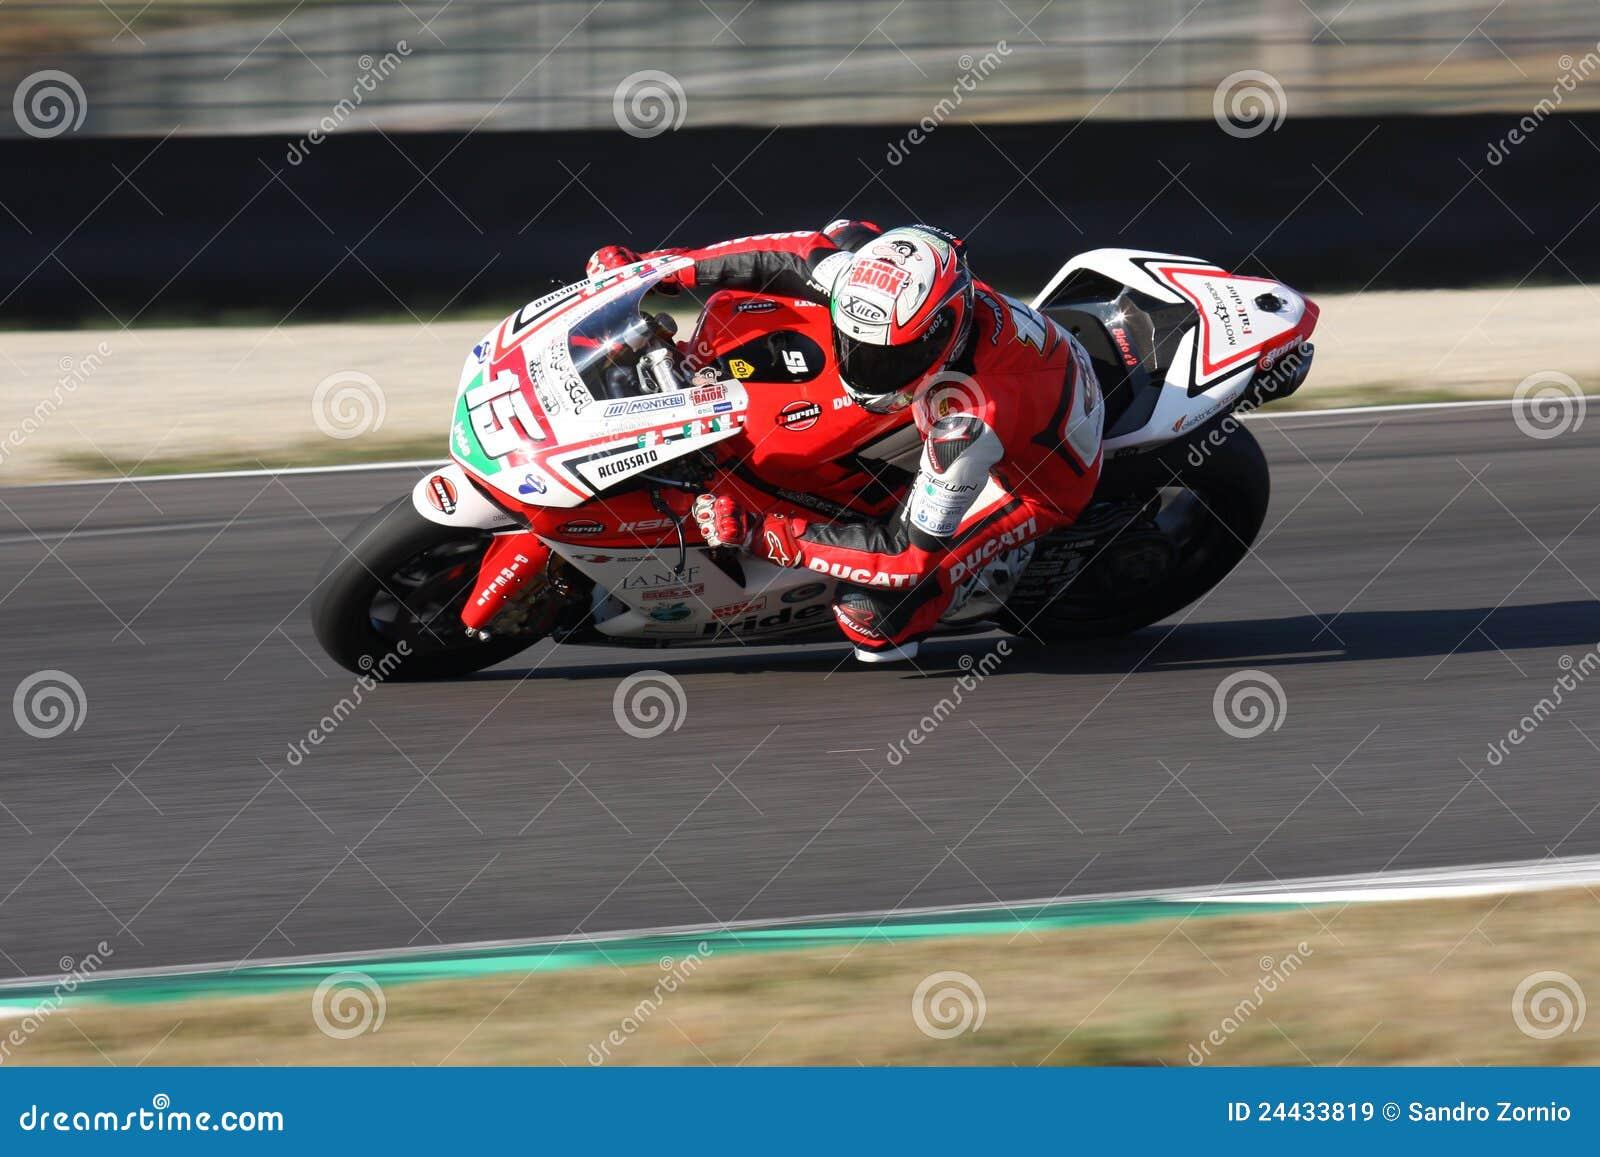 Matteo Baiocco - Ducati 1198R - Barni Racing